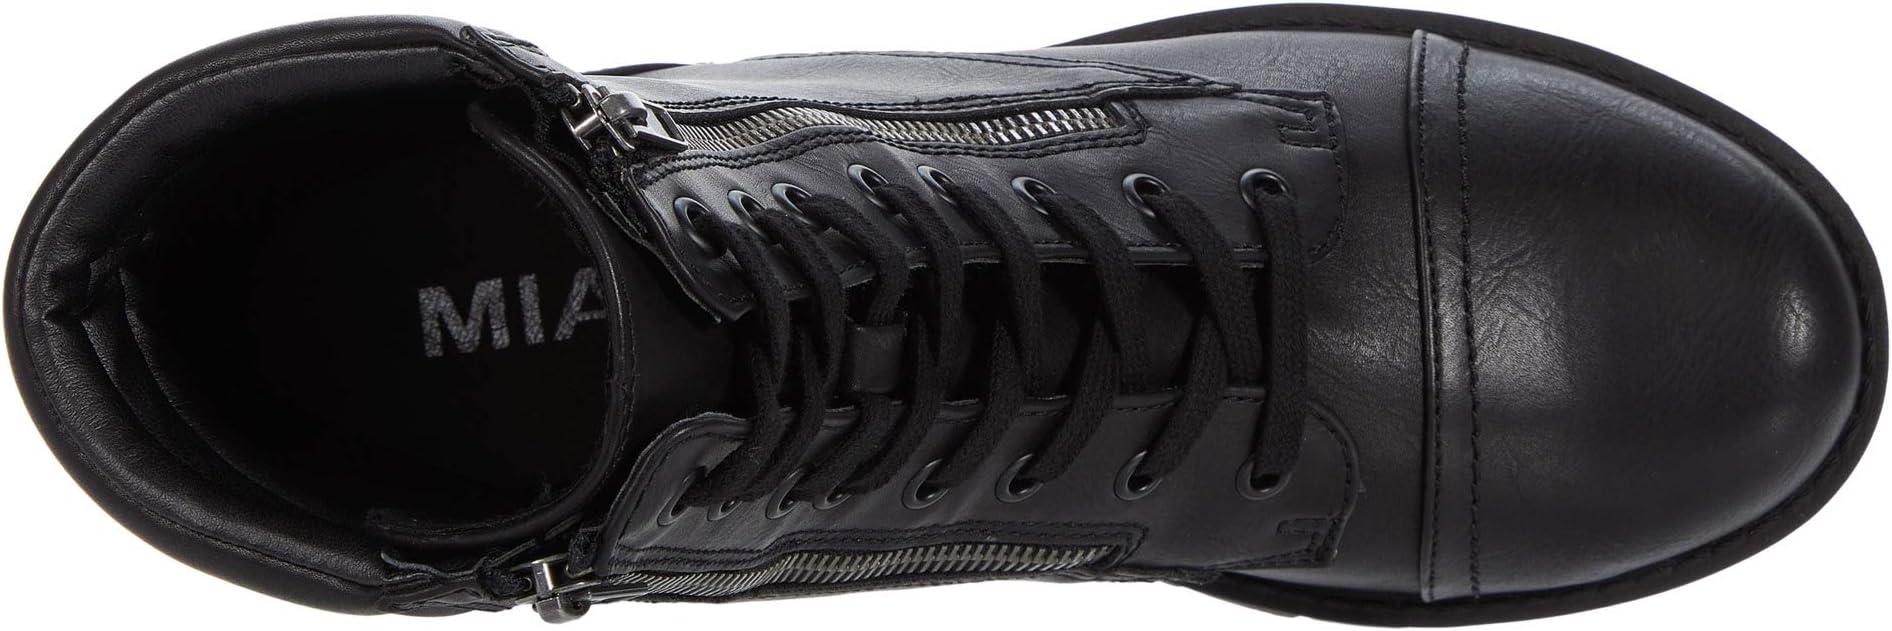 MIA Nelson   Women's shoes   2020 Newest